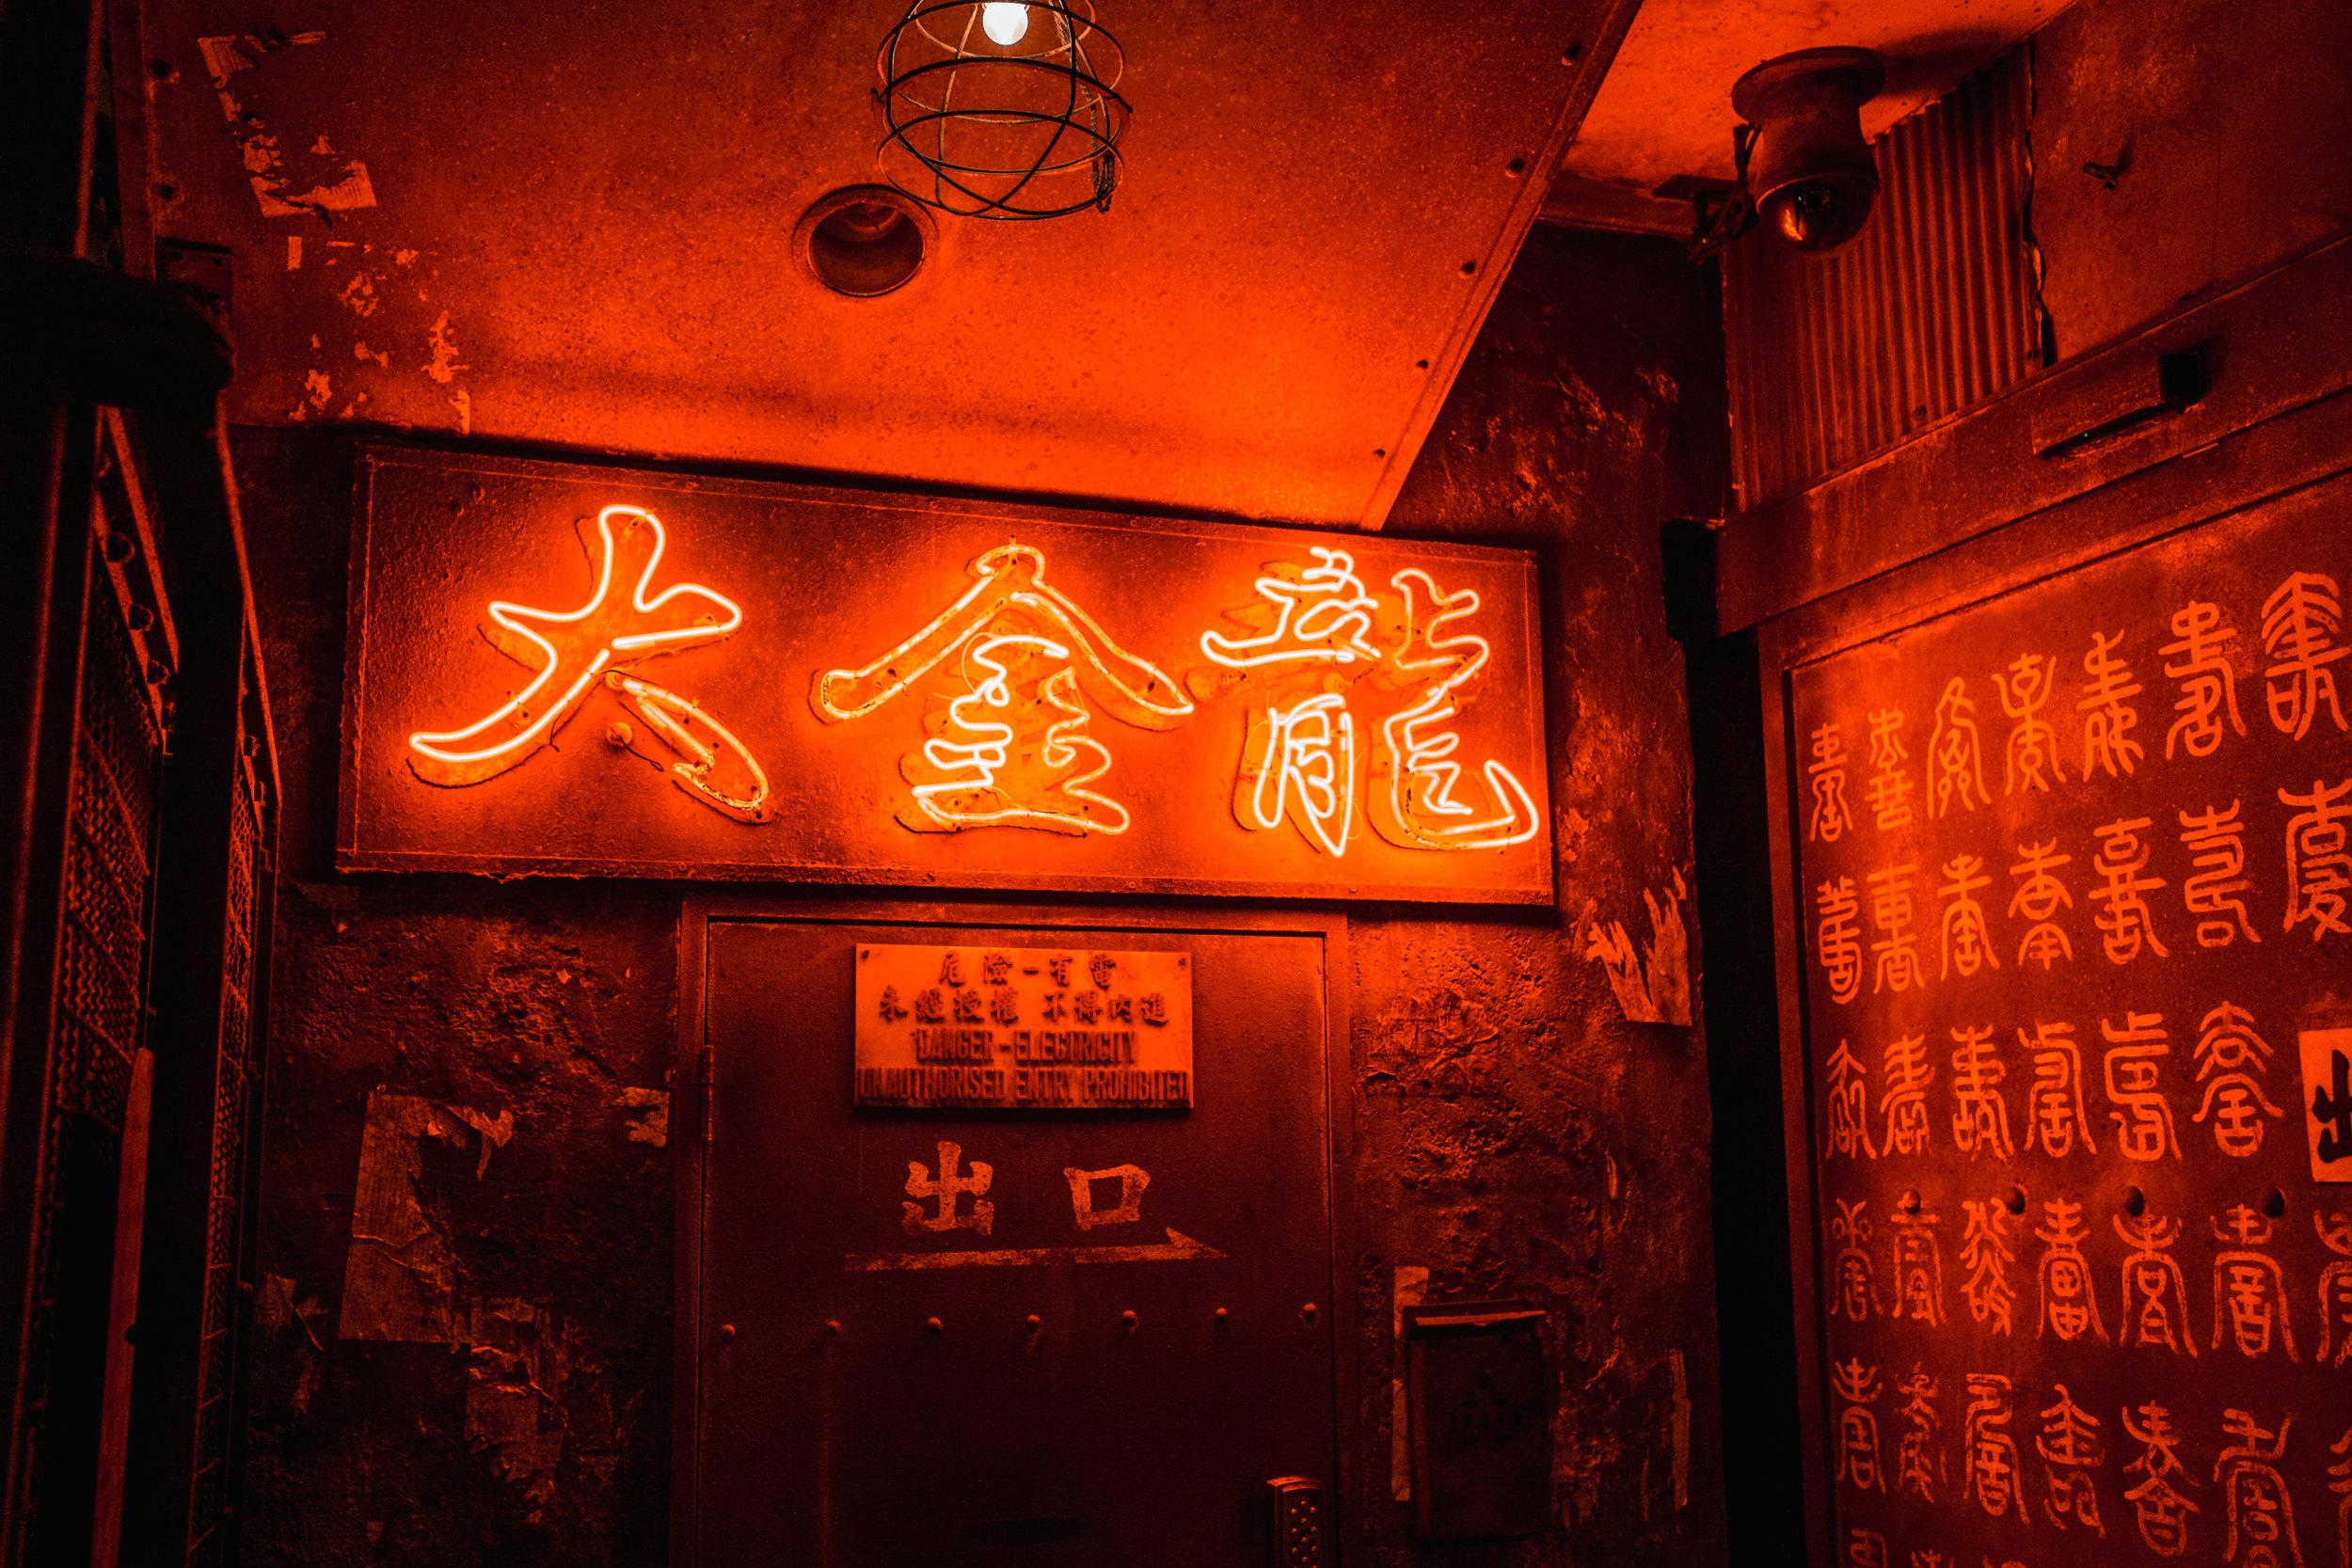 TokyoJapan_2018_AdamDillon_DSCF9300.jpg